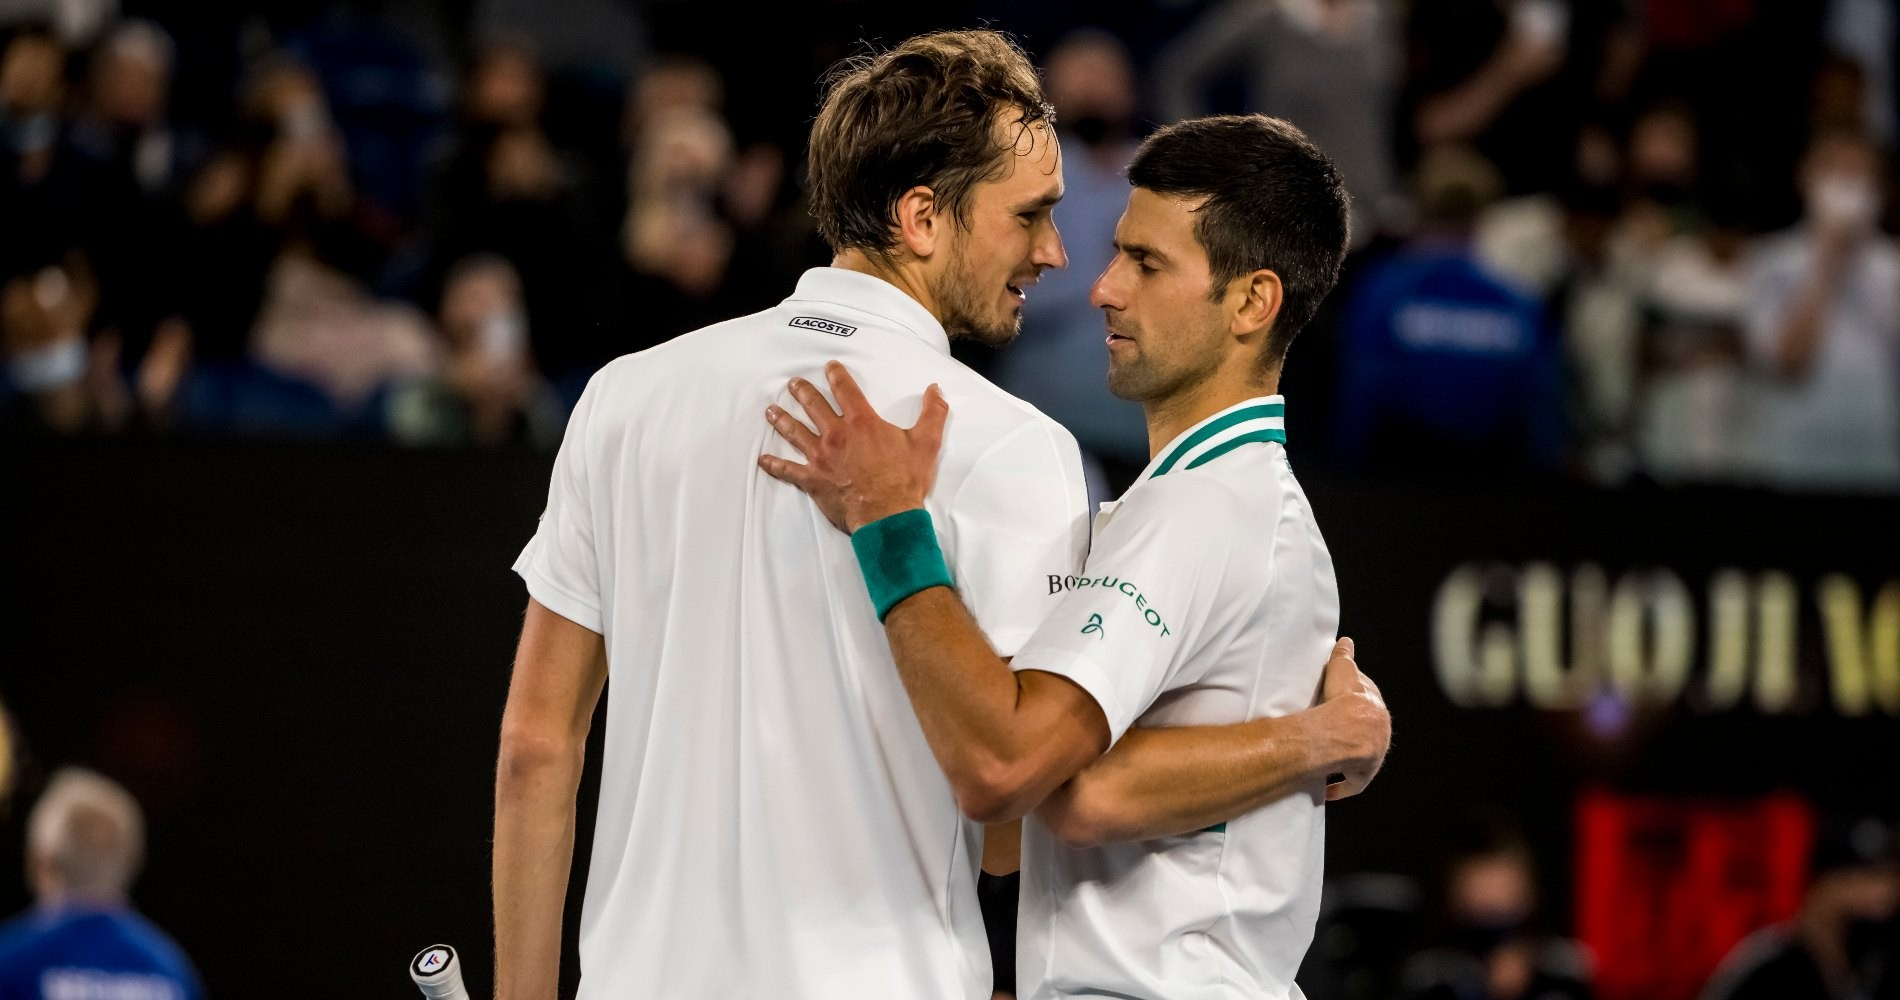 Daniil Medvedev & Novak Djokovic, 2021 Australian Open Final